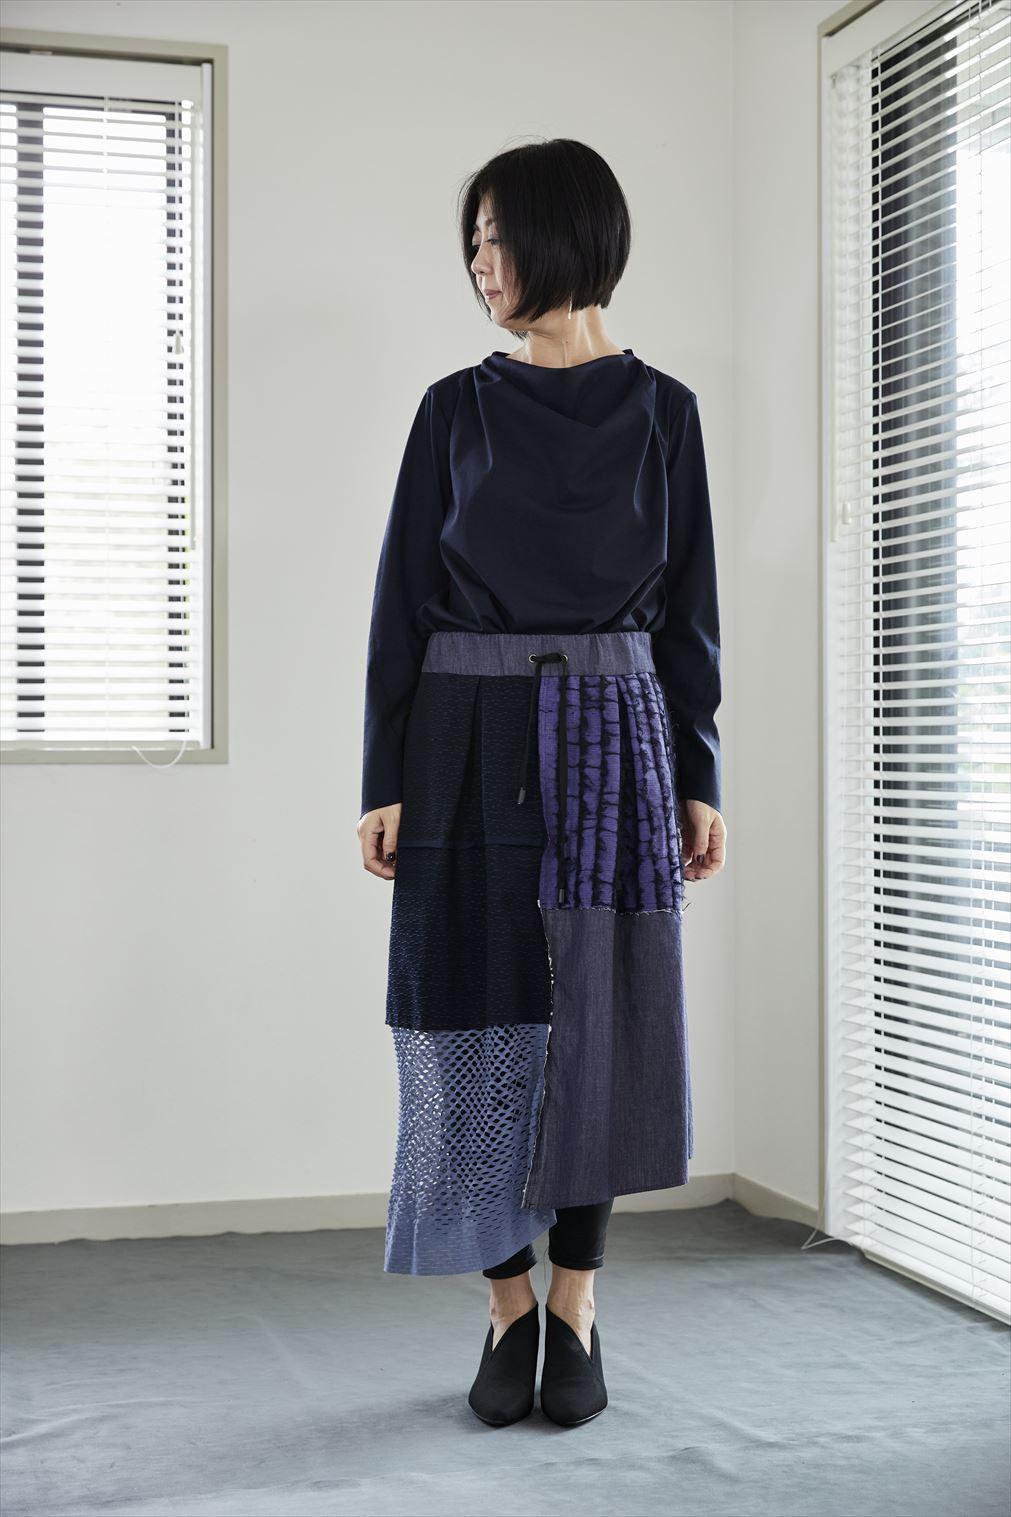 Patchwork skirt ネイビー NAVY  着るアート 532-06-21[MADE IN JAPAN][税/送料込]